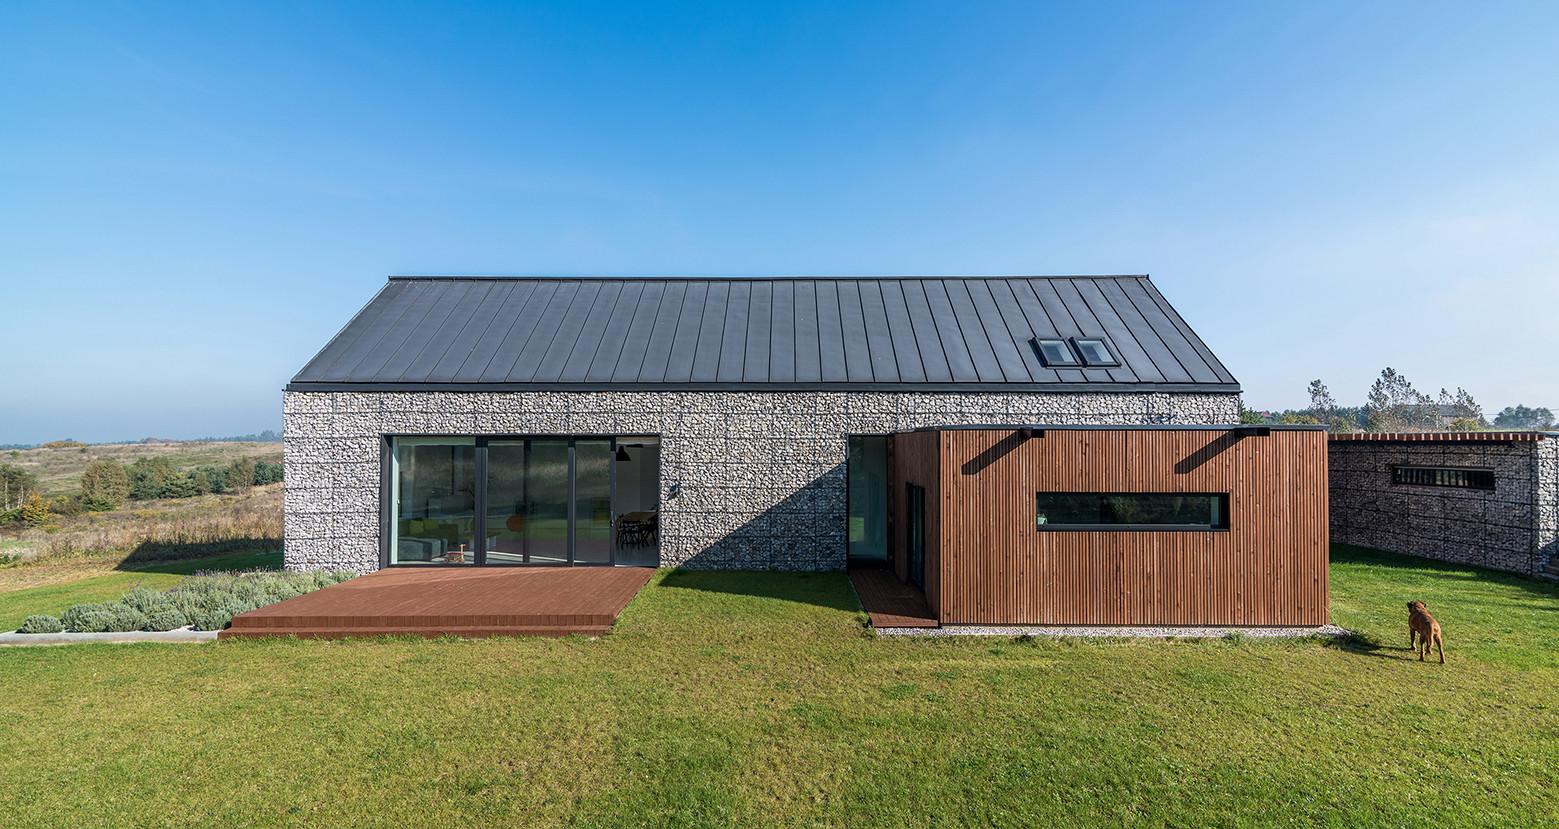 Casa en el paisaje / Kropka Studio, © Maciej Lulko